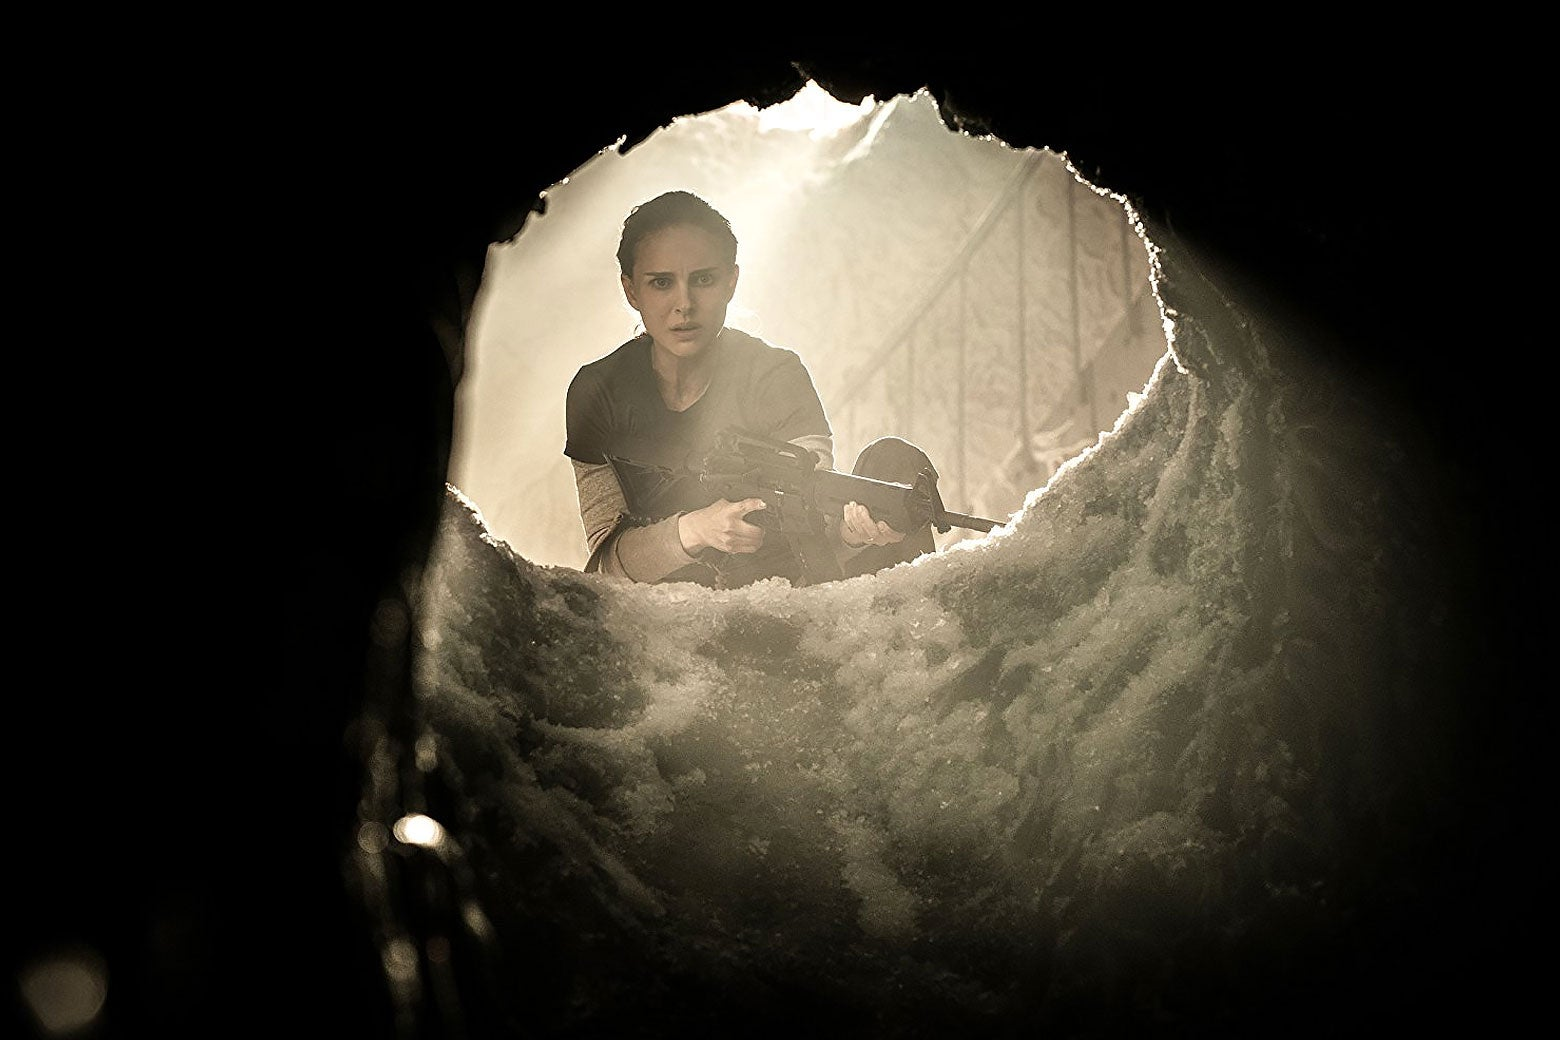 Natalie Portman as Lena in Annihilation.